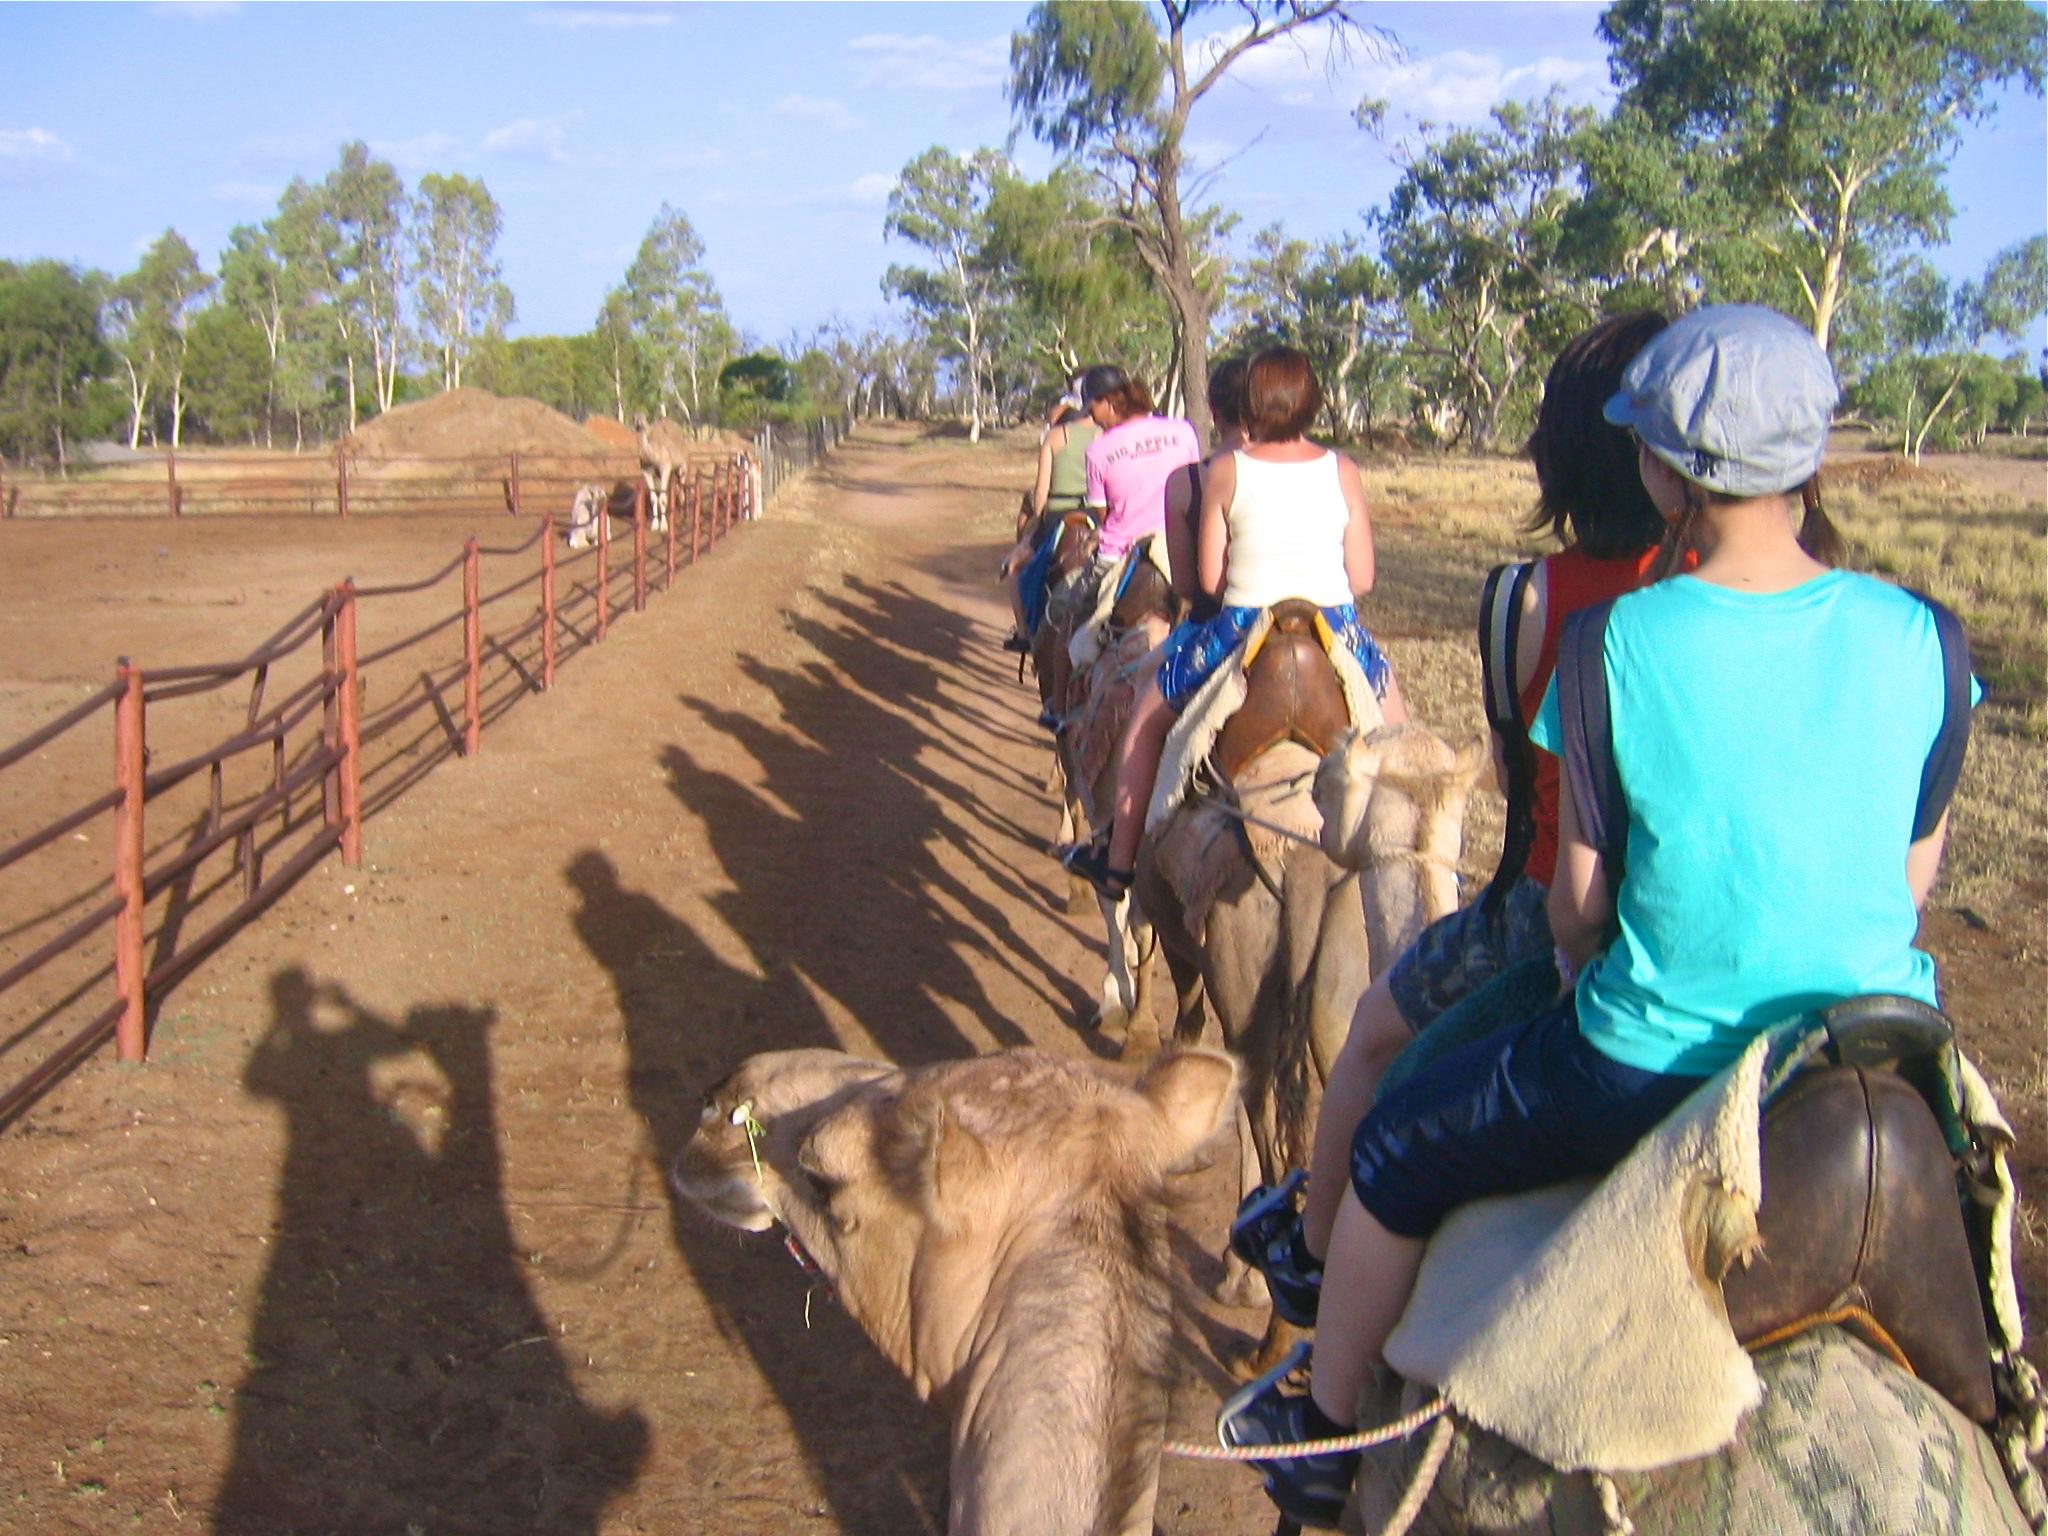 The Australian Outback Australia Alice Springs camel sunset aroundtheworldwithjustin.com